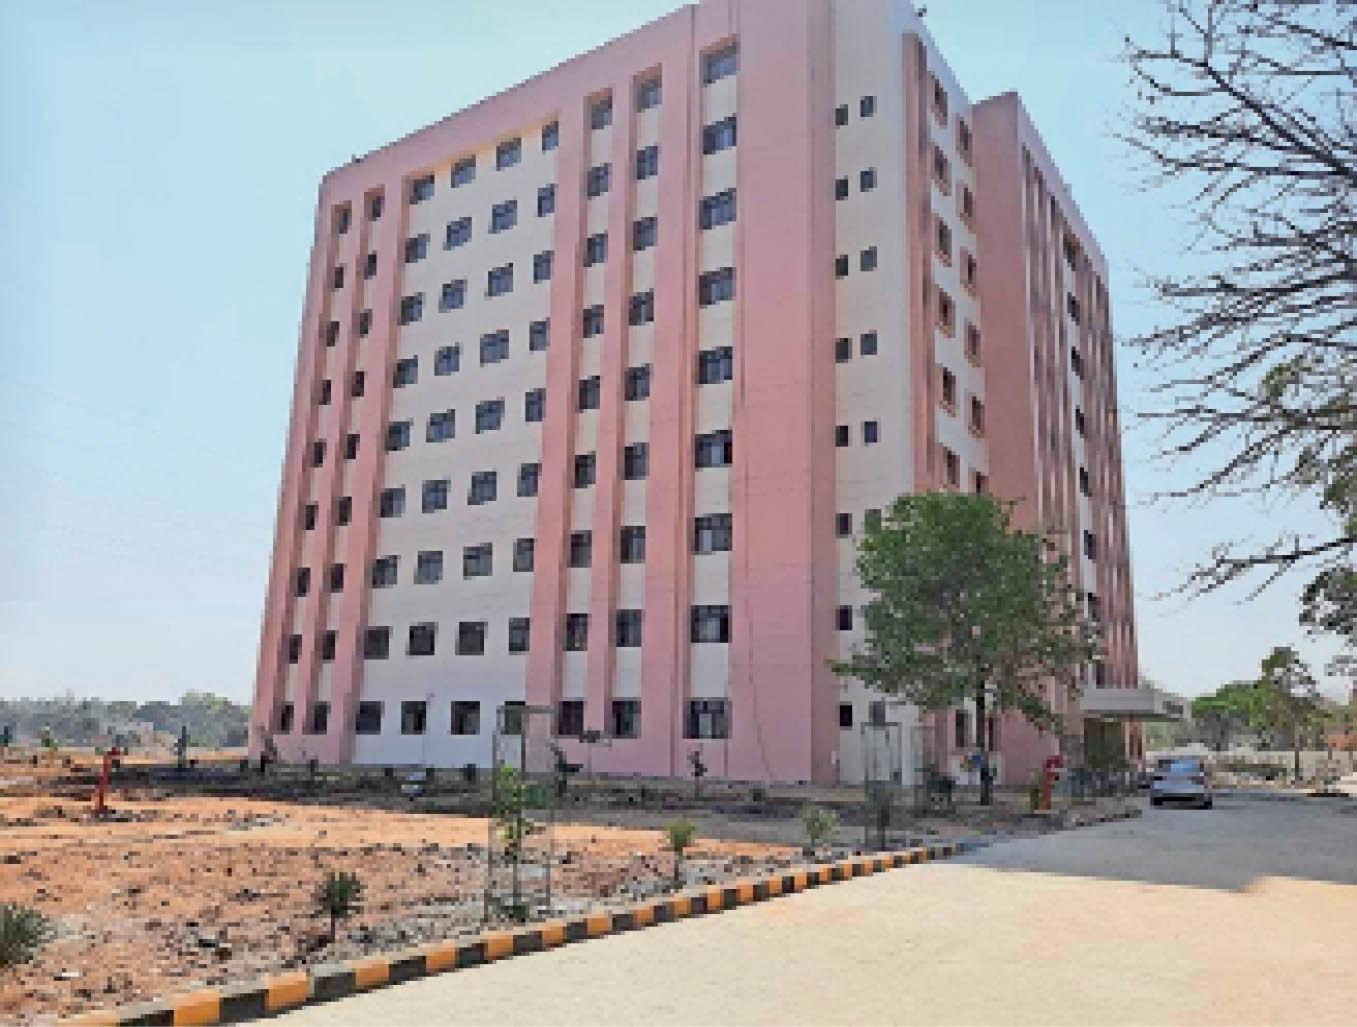 जमशेदपुर महिला विश्वविद्यालय - Dainik Bhaskar